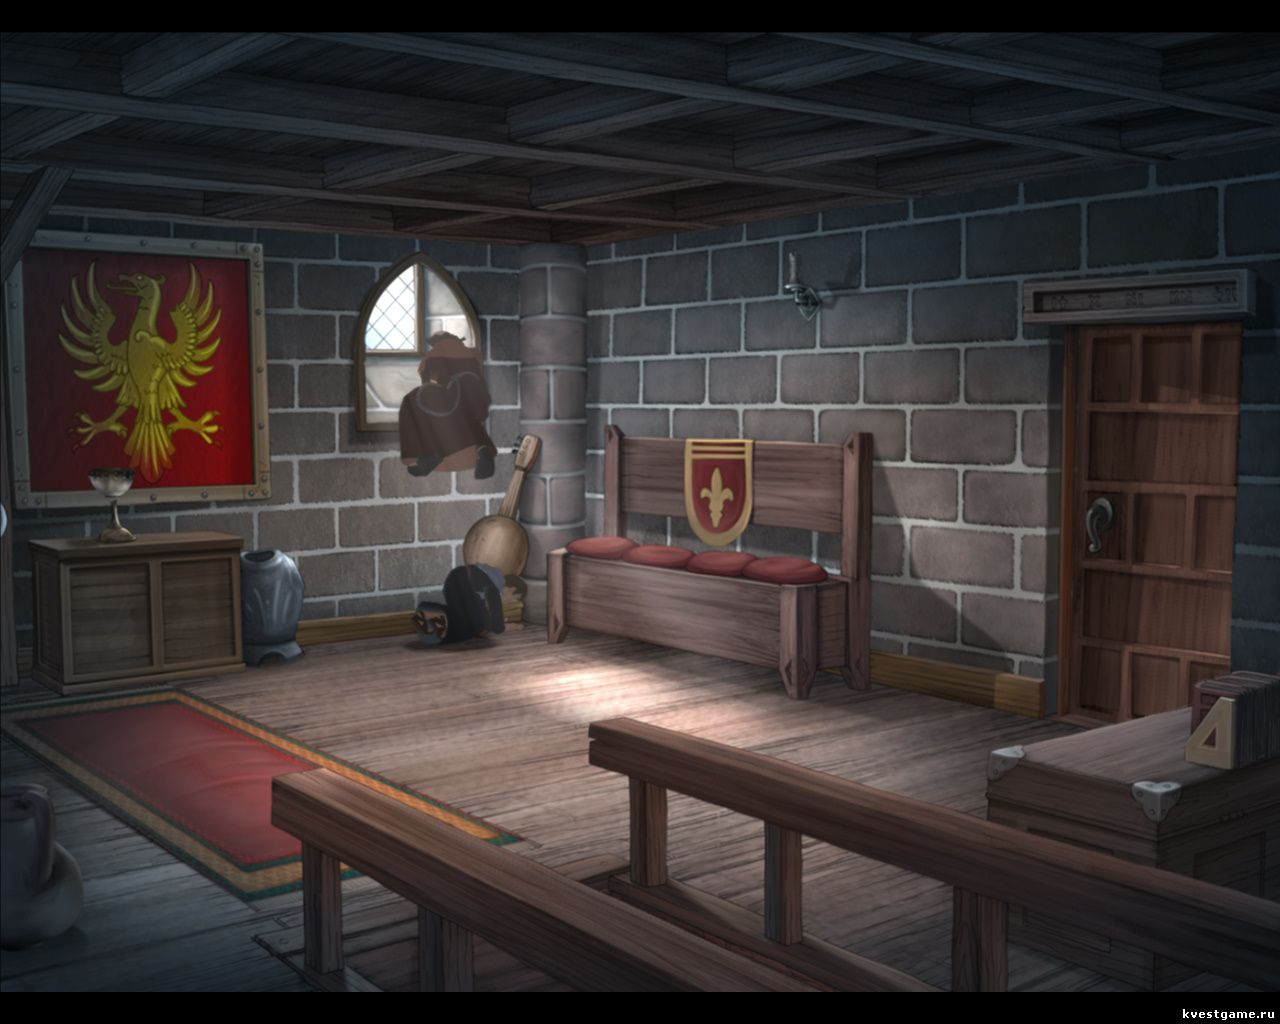 Murder in the Abbey - Бруно помогает учителю вылезти в окно (глава 2)